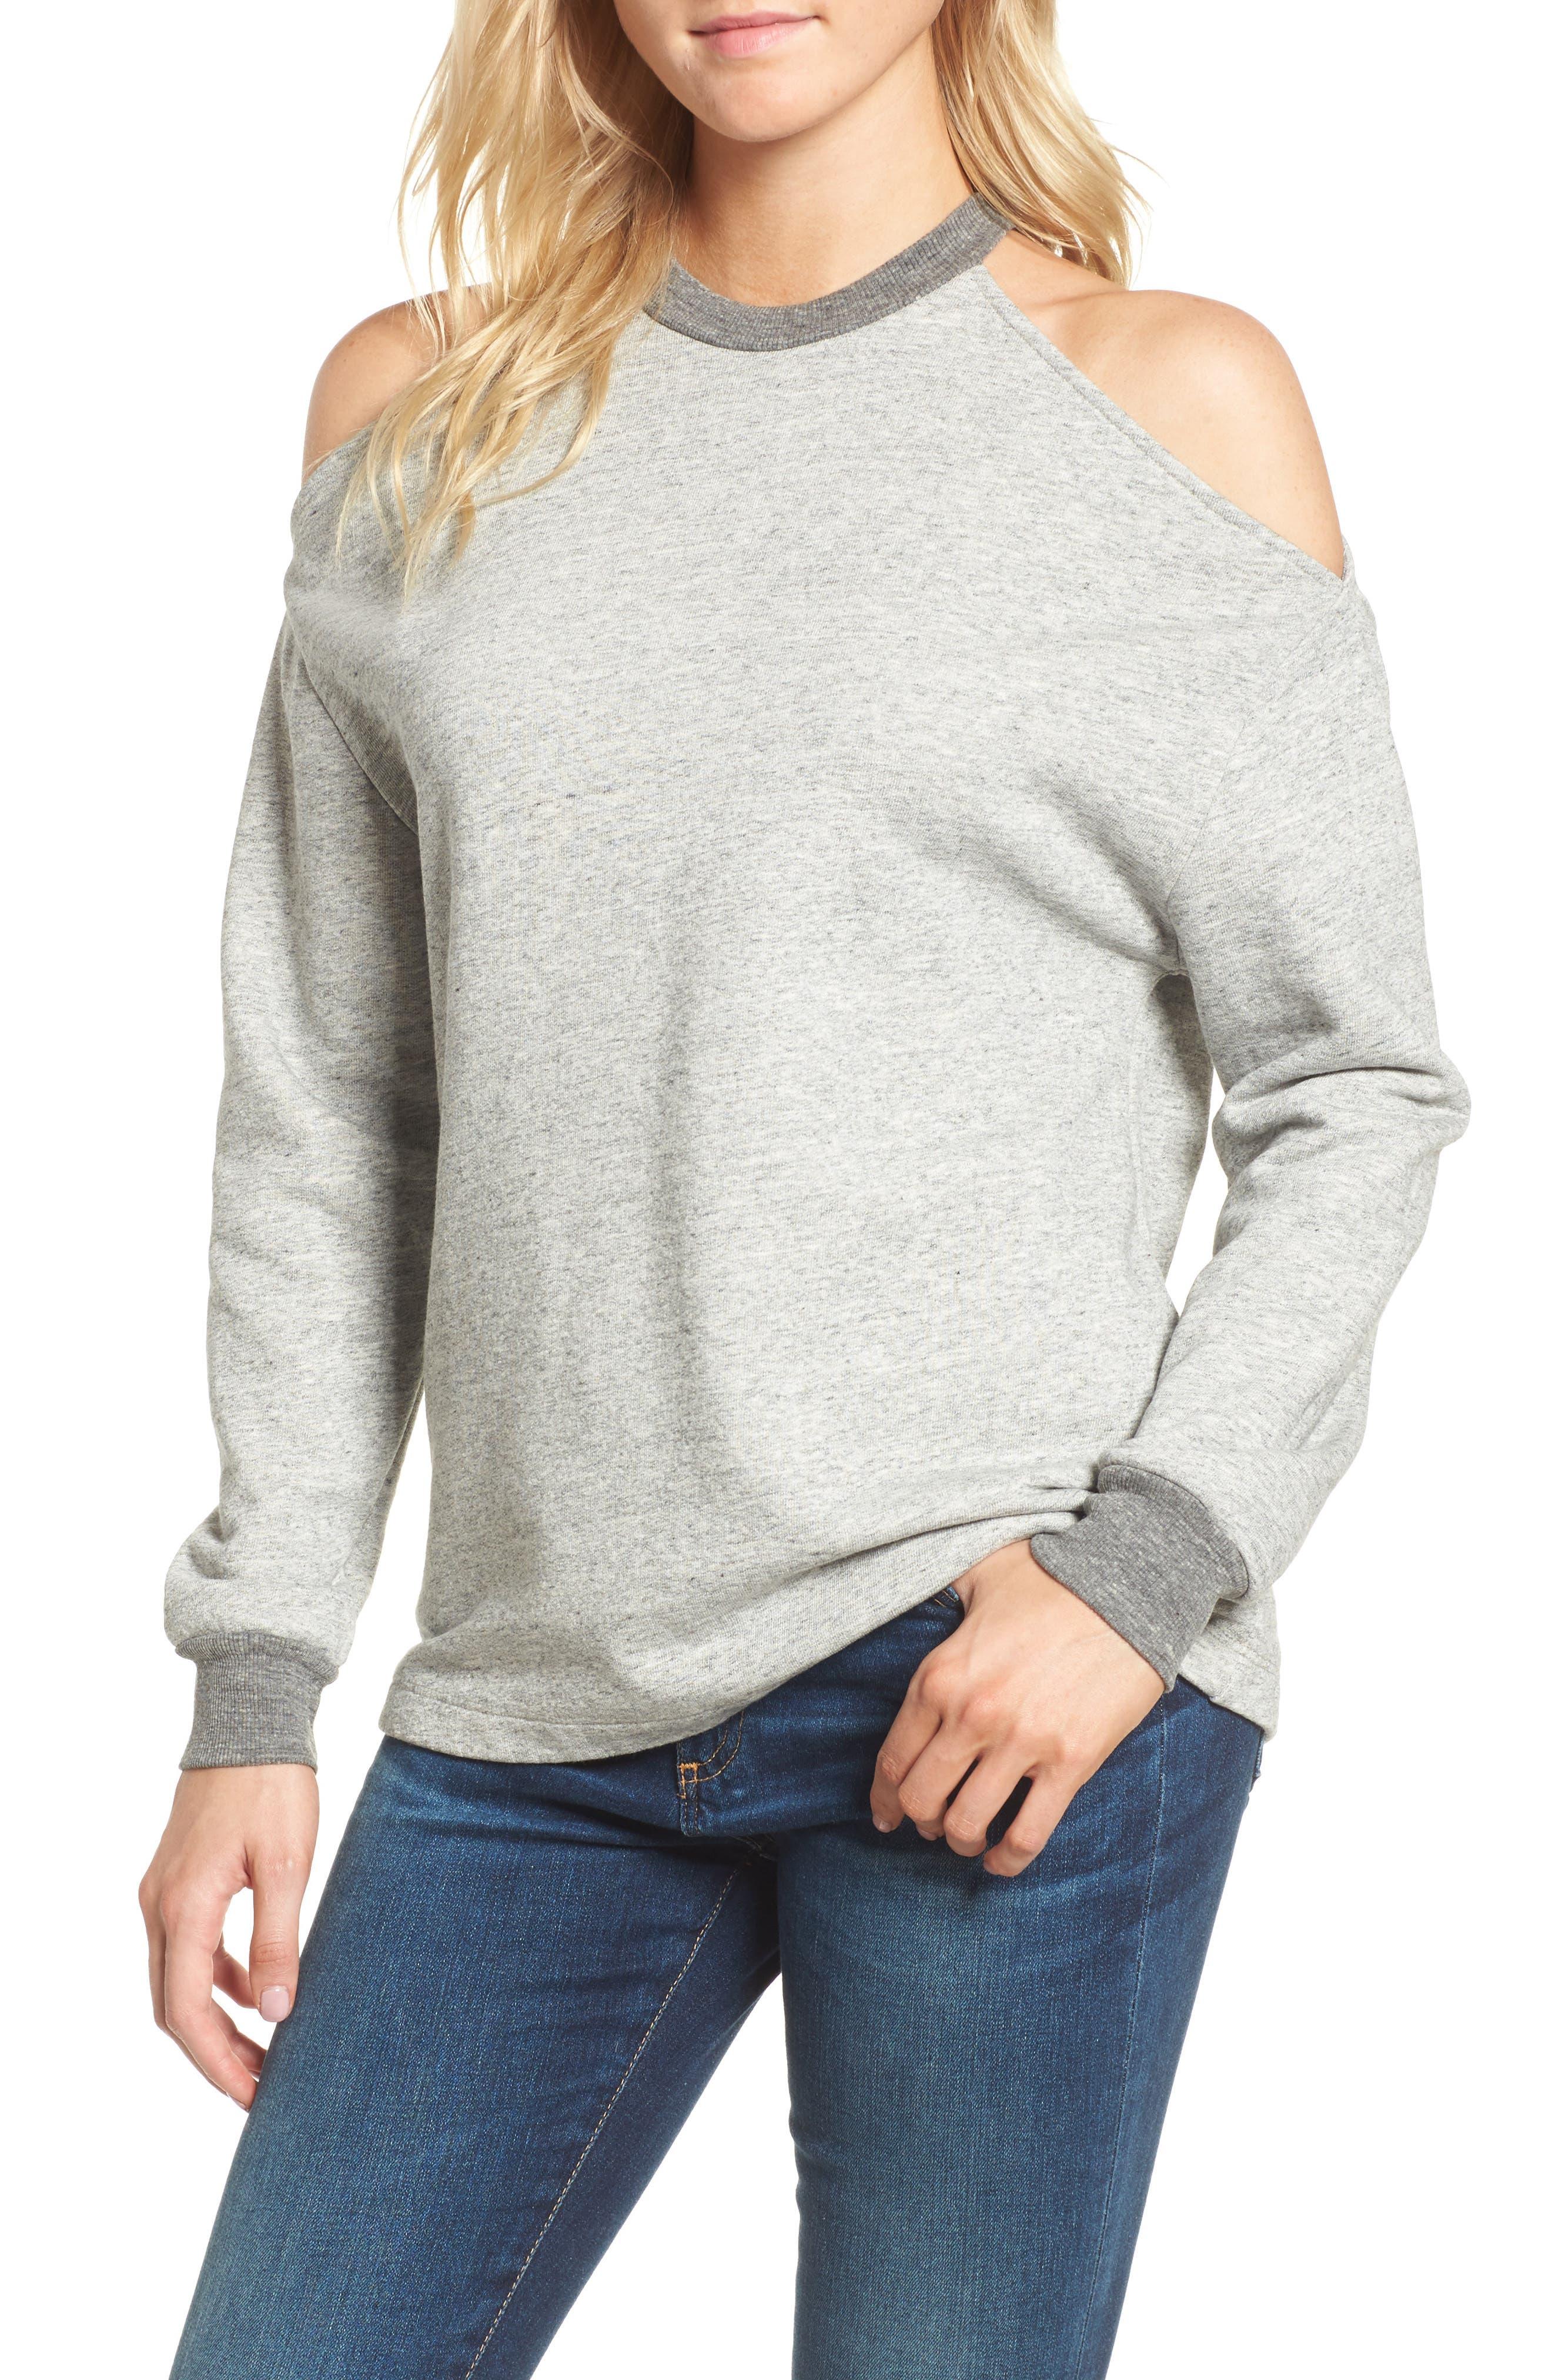 Gizi Cold Shoulder Sweatshirt,                             Main thumbnail 1, color,                             022